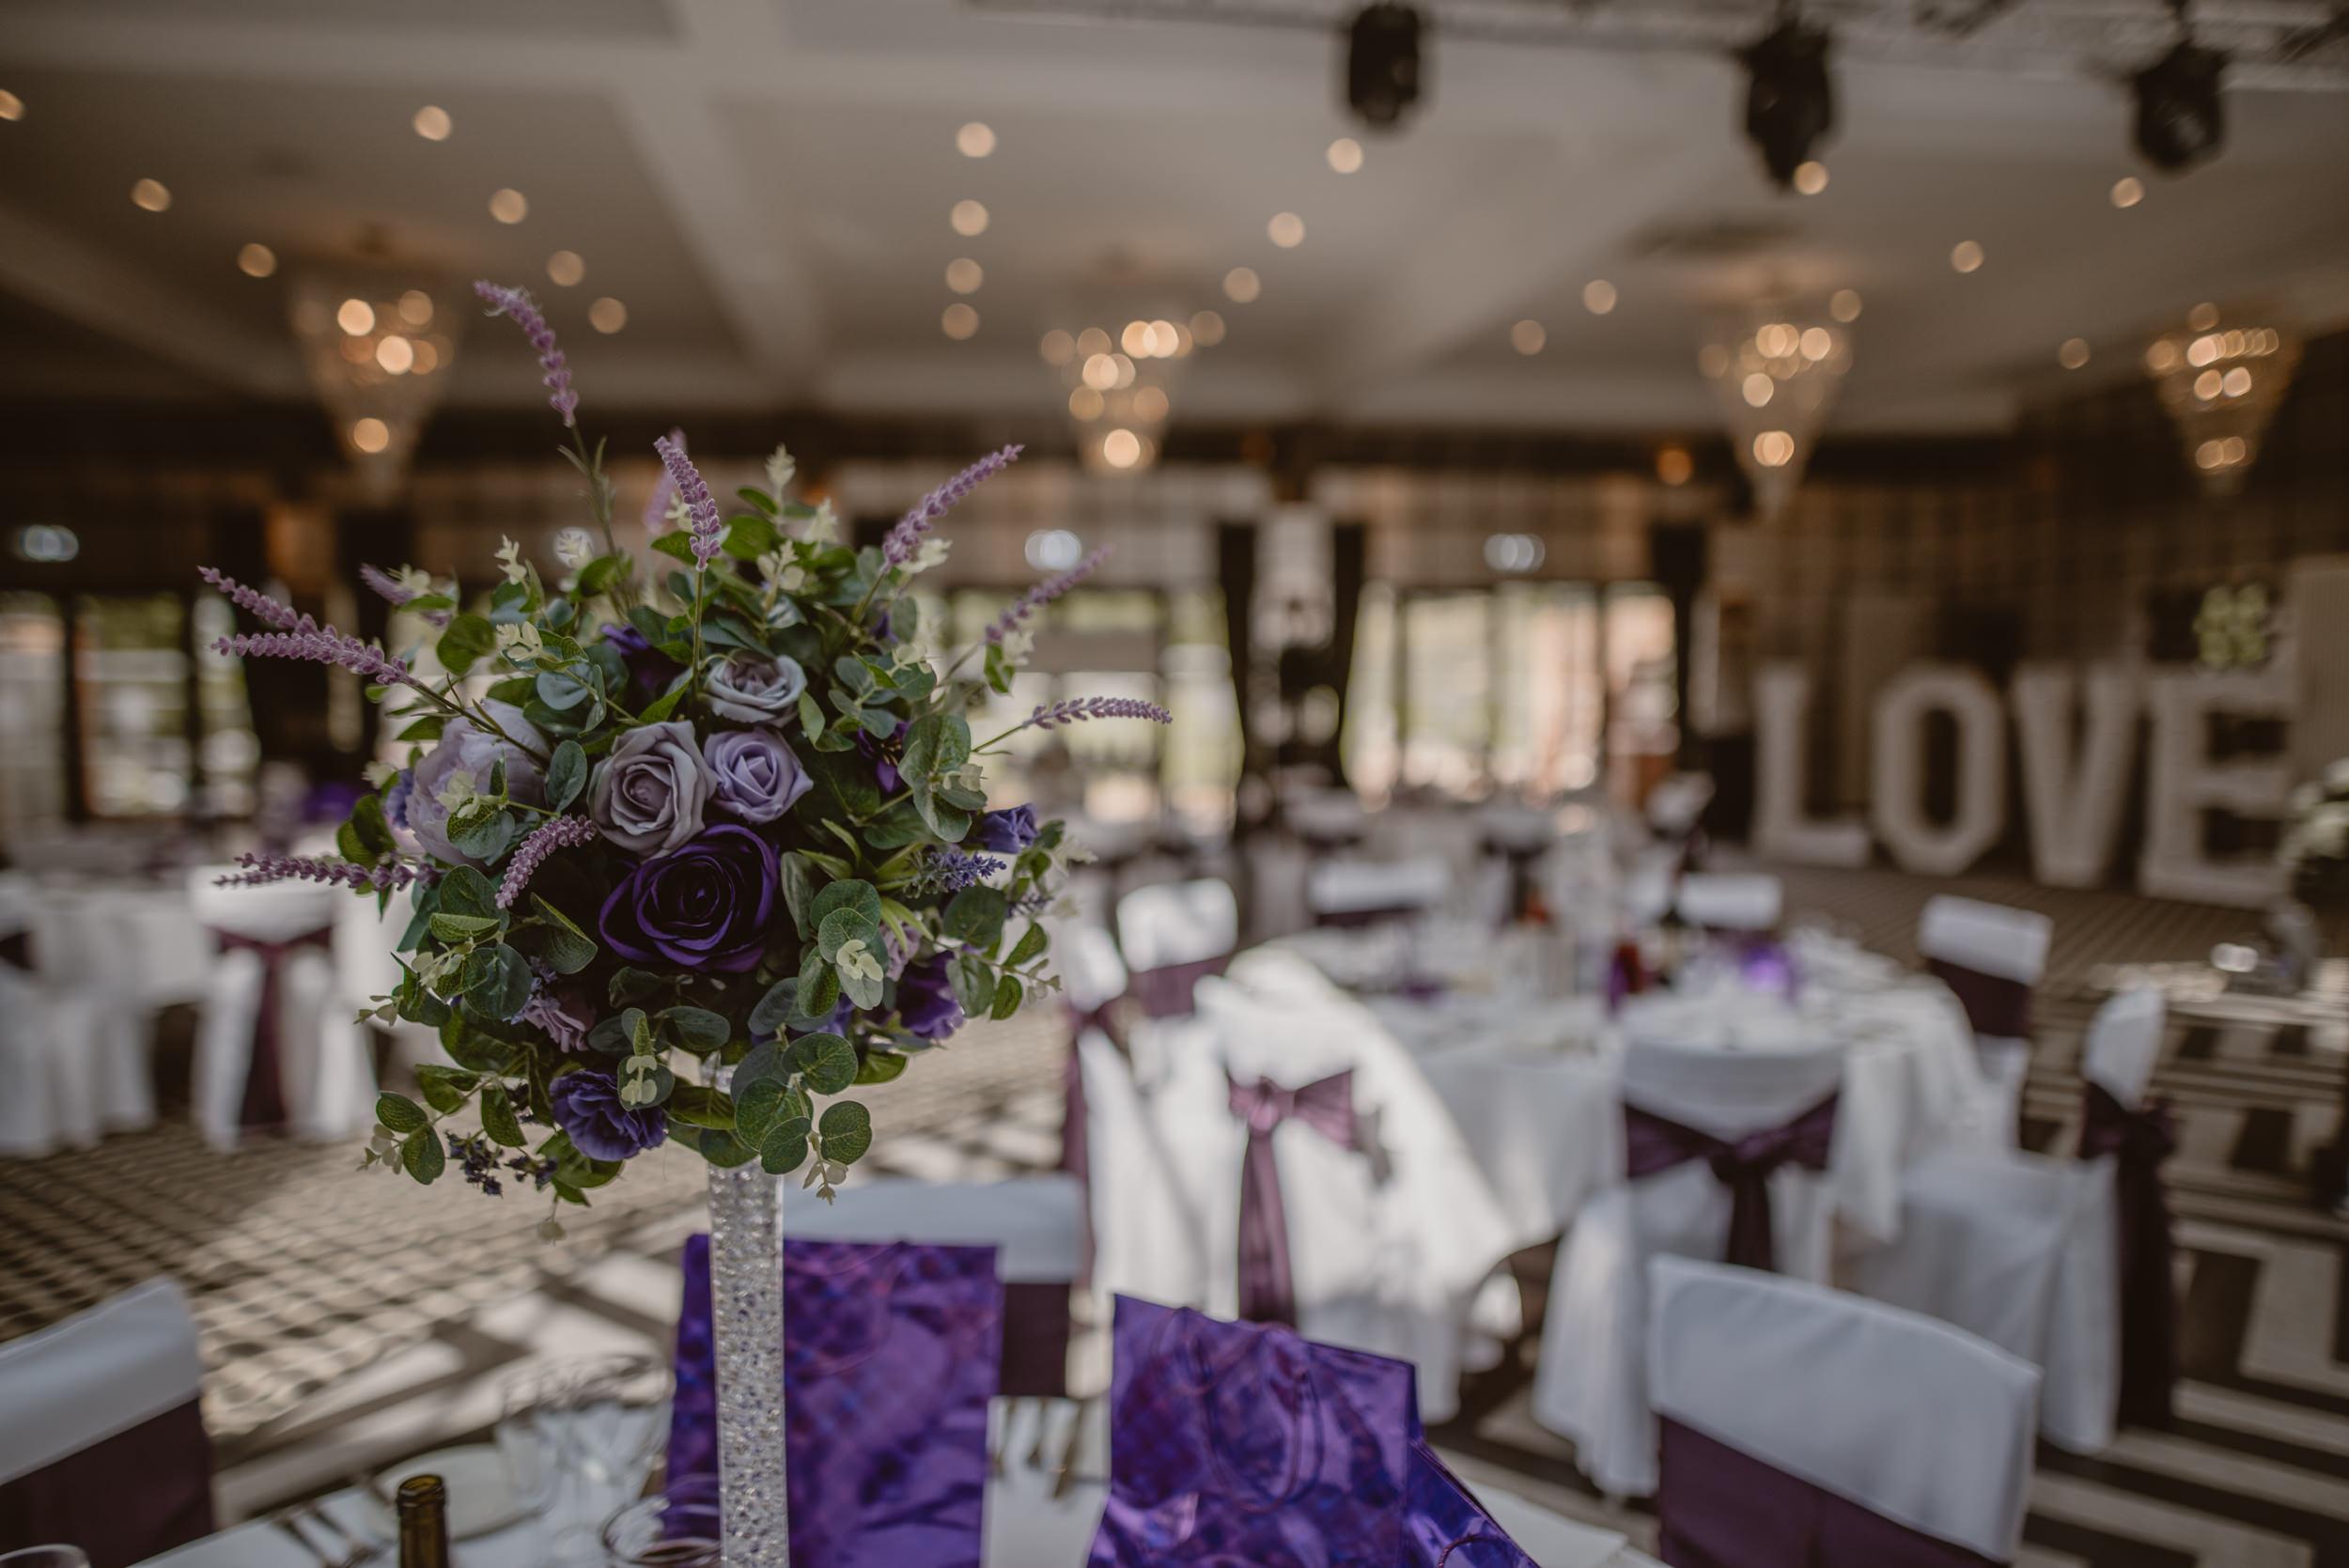 Chantelle-and-Stephen-Old-Thorns-Hotel-Wedding-Liphook-Manu-Mendoza-Wedding-Photography-321.jpg